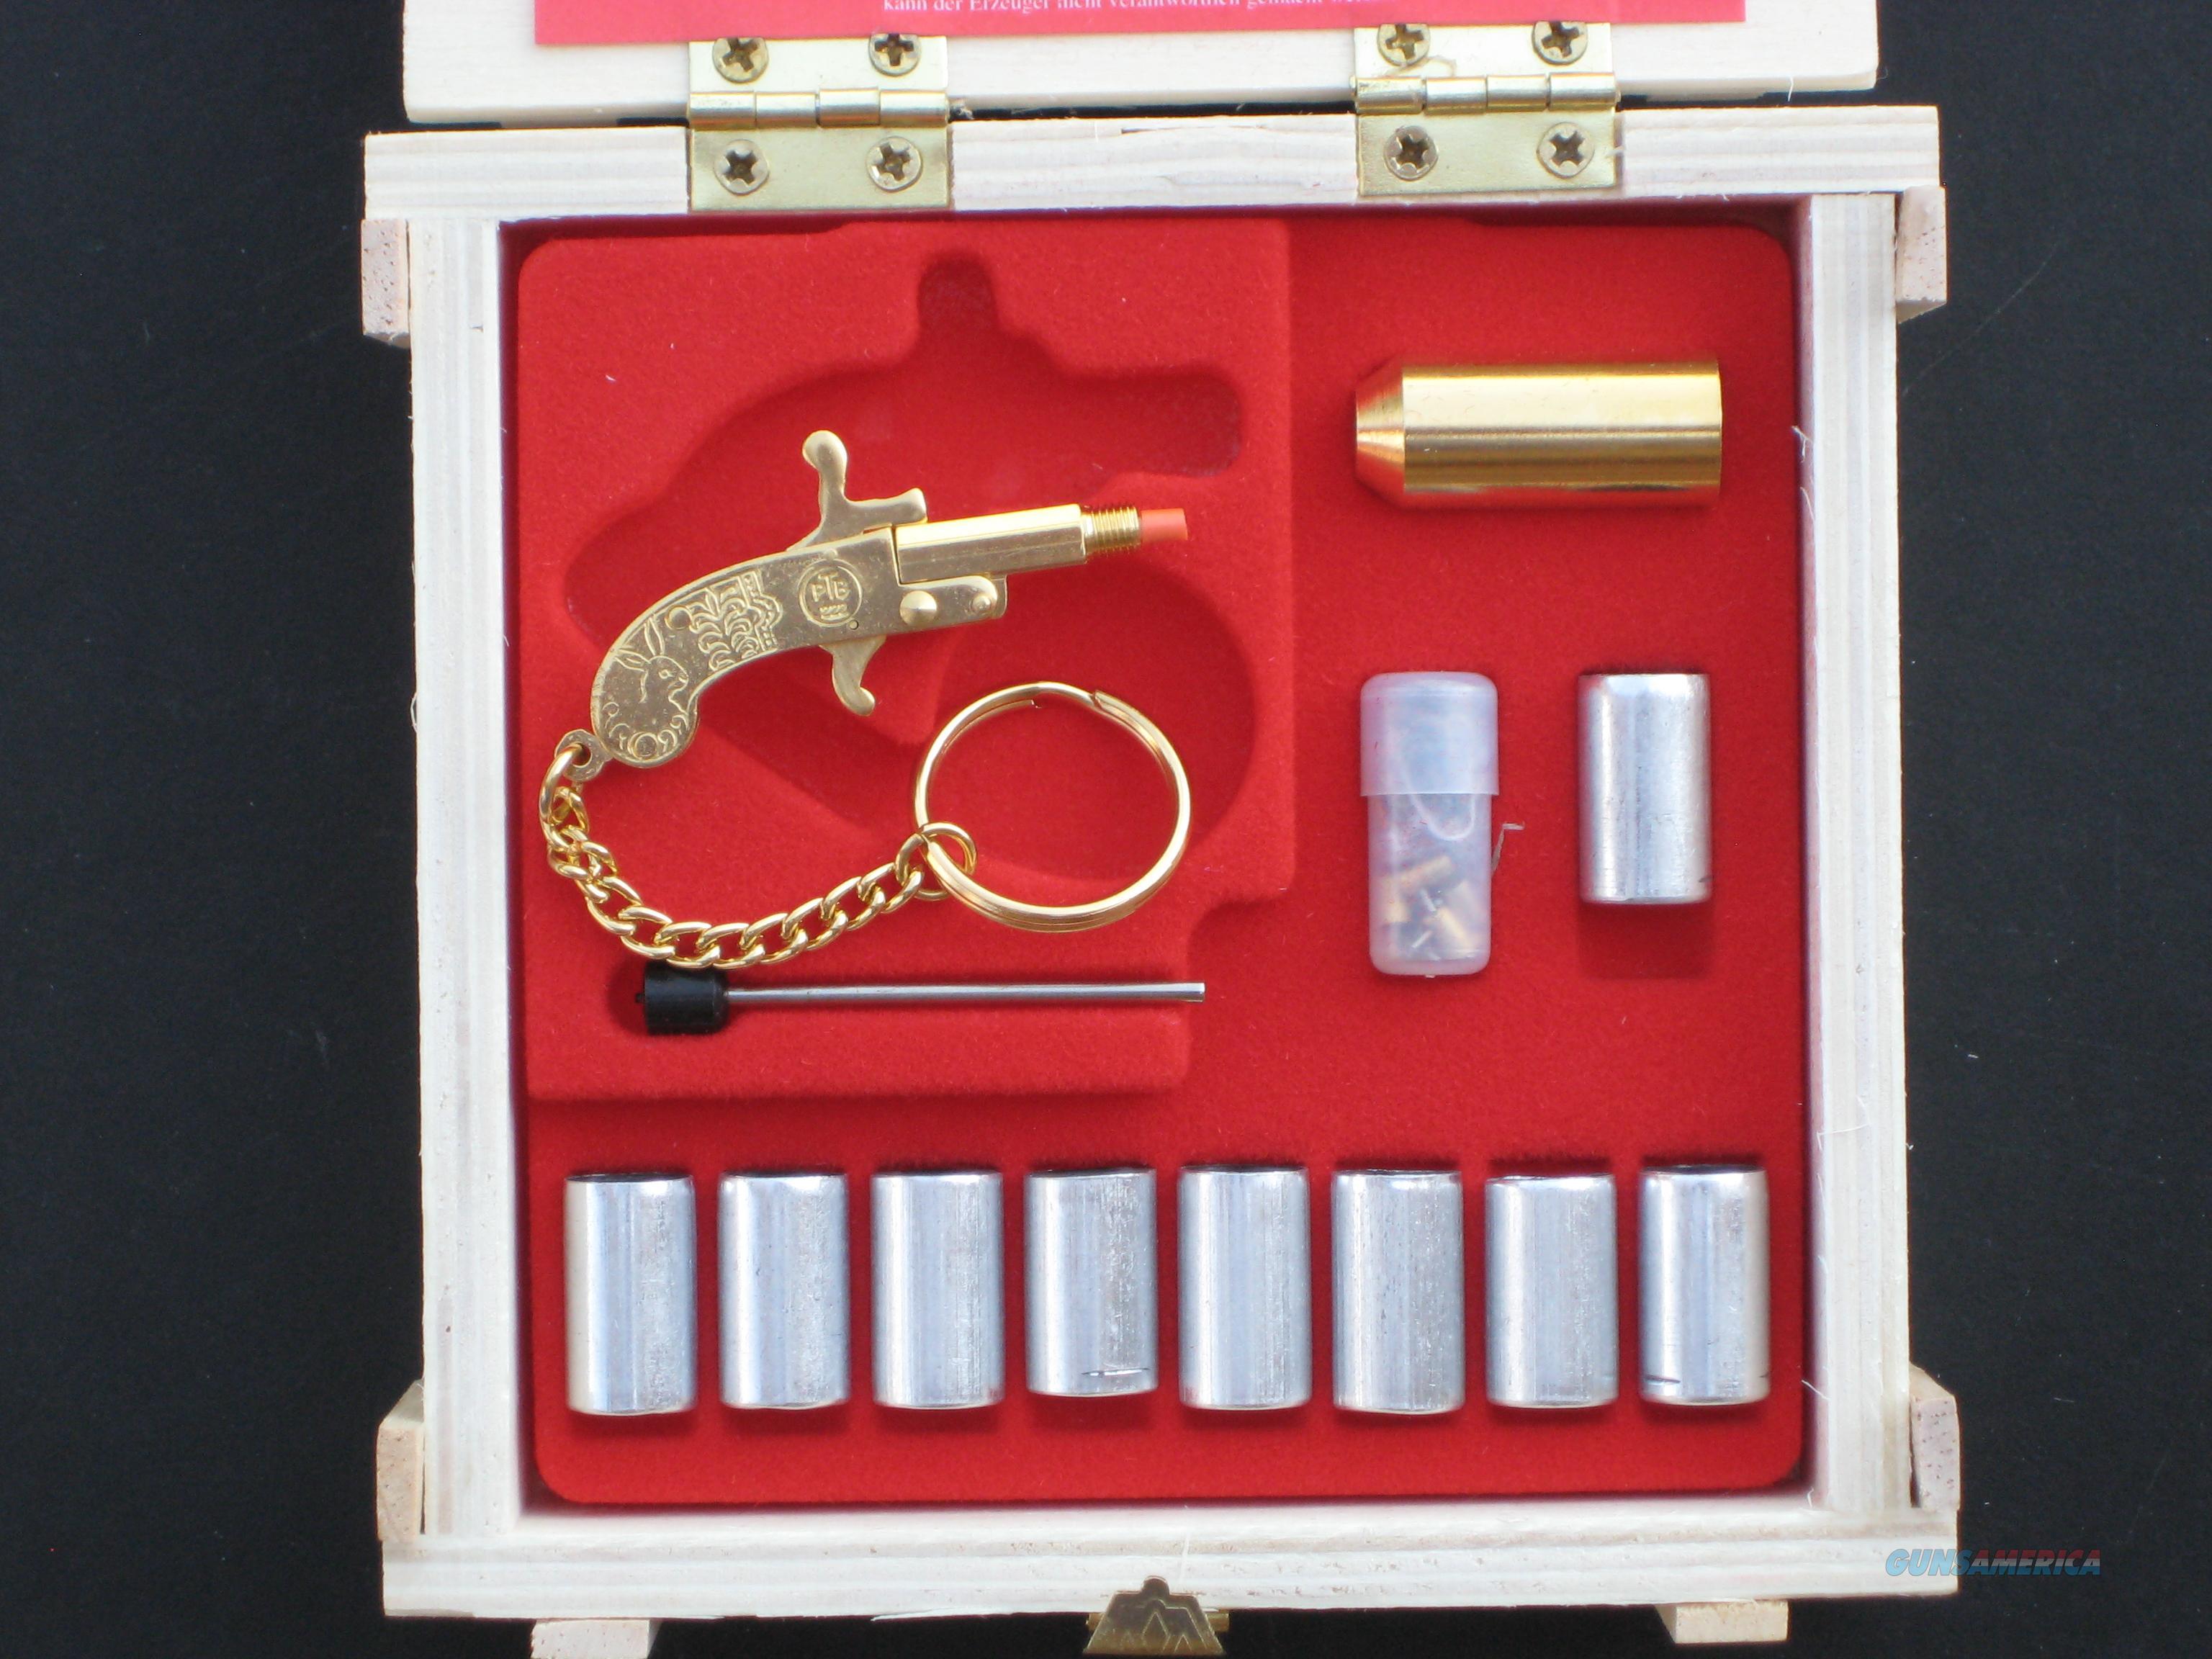 2mm PINFIRE BERLOQUE MINIATURE CAP GUN FLARE GUN SET ( LUXURY VERSION)  Non-Guns > Curios